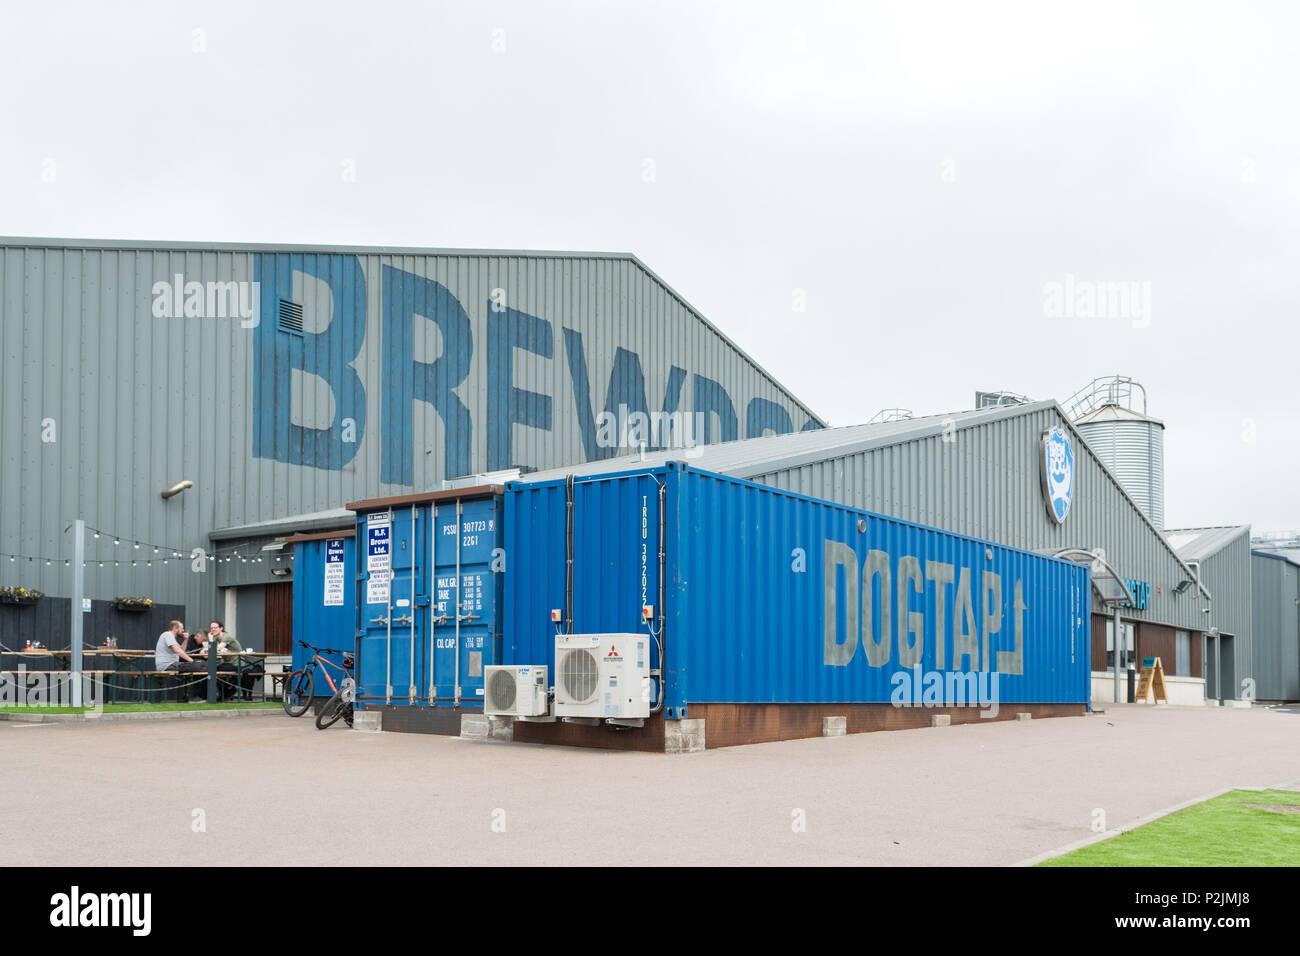 BrewDog brewery and DogTap, Ellon, Aberdeenshire, Scotland, UK - Stock Image